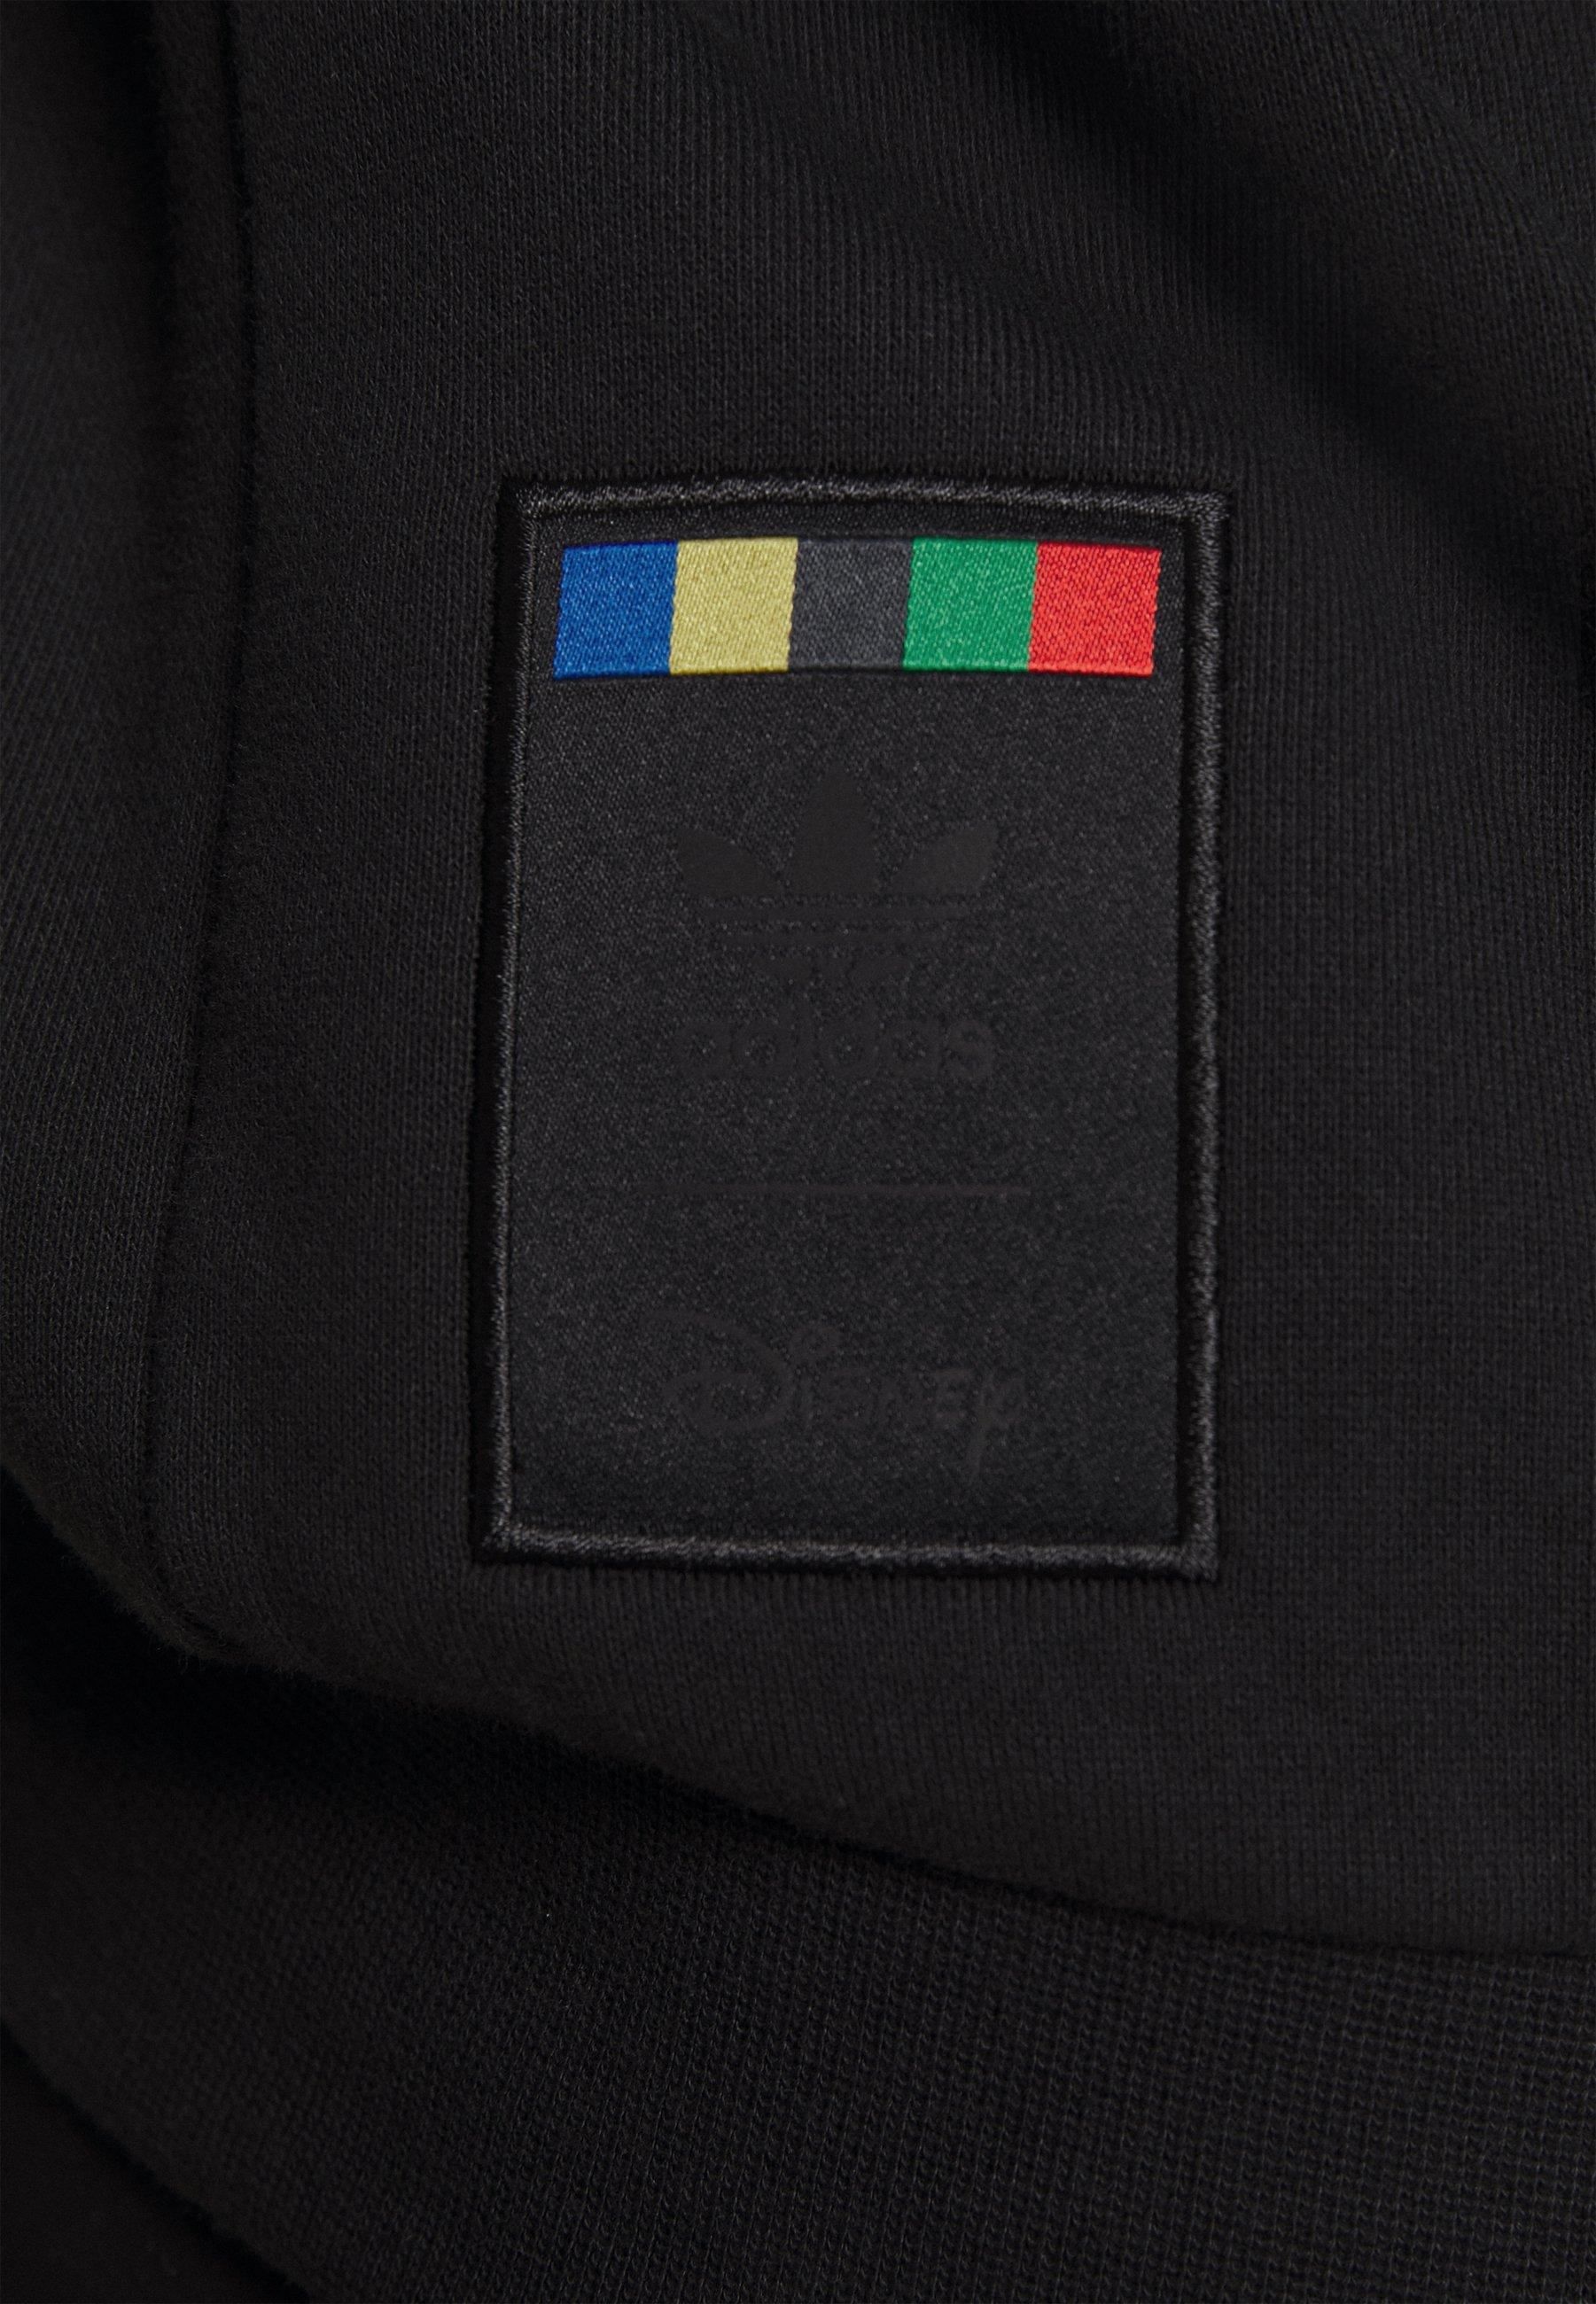 Adidas Originals Goofy Crew - Sweatshirt Black/svart